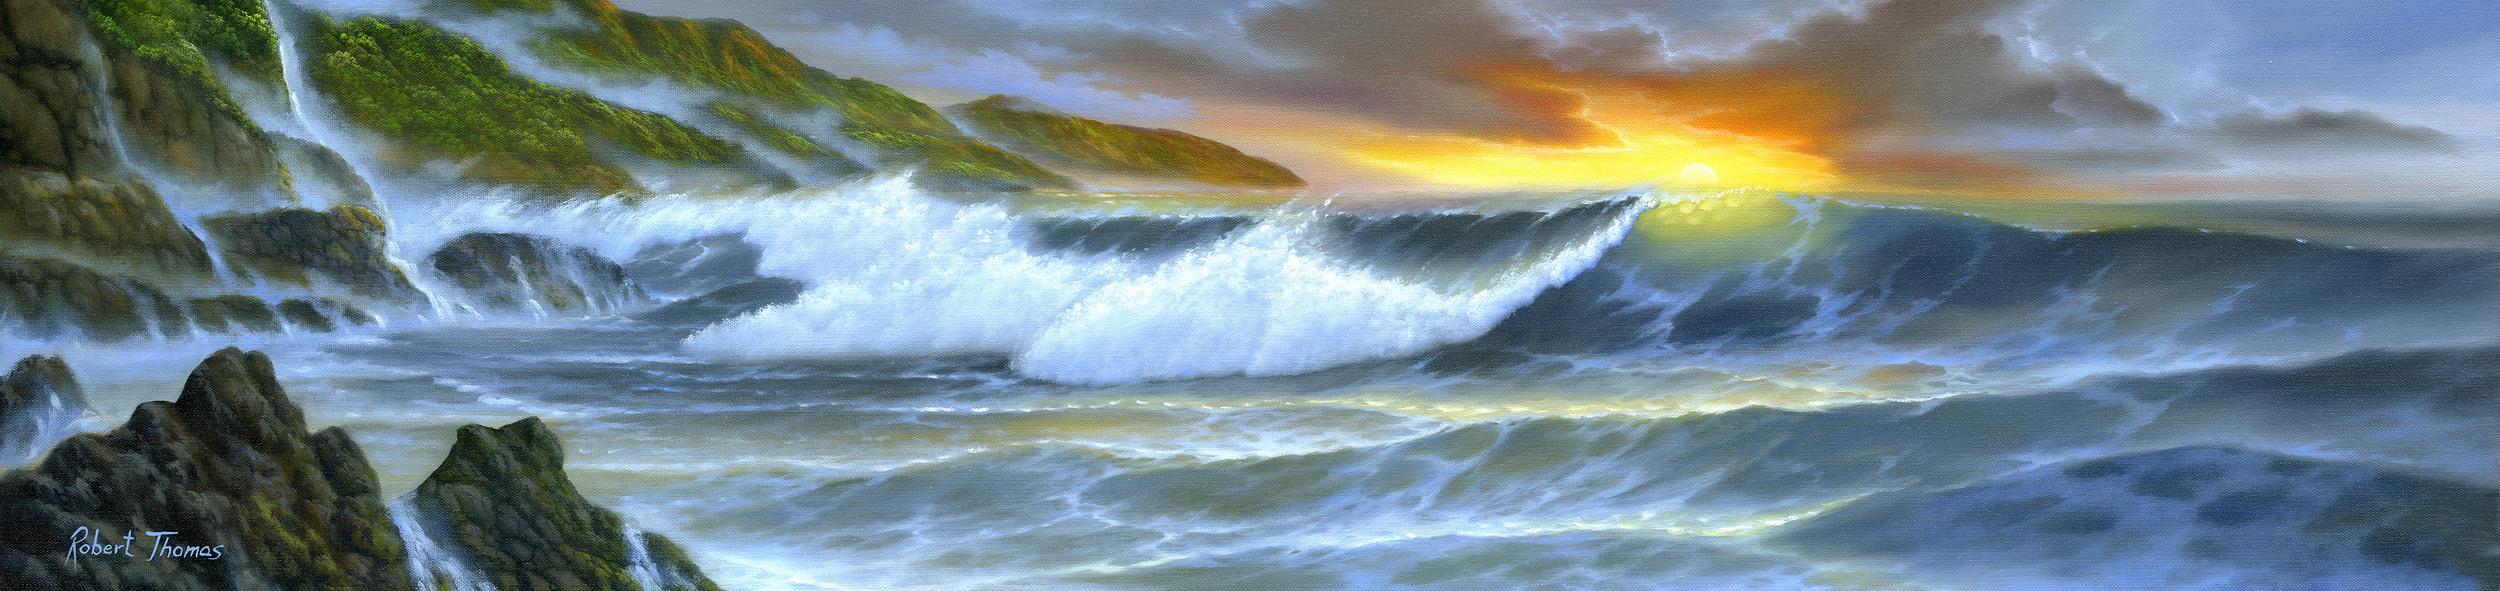 """Ocean Breaker"" 12x48"